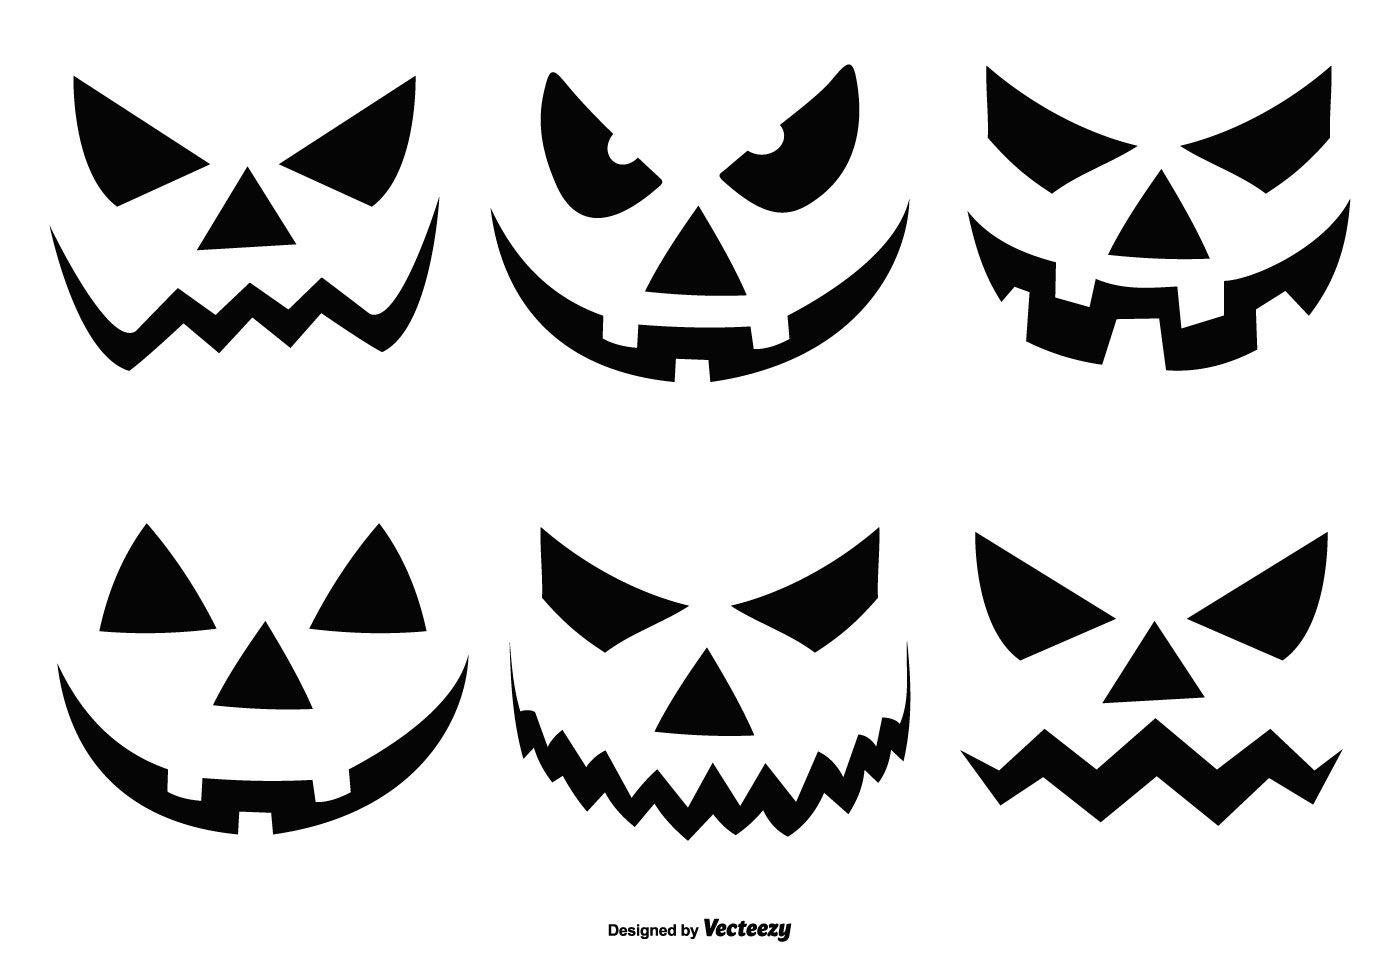 Coleccion De Caras De Calabaza De Halloween Calabazas De Halloween Caras De Calabazas Siluetas De Halloween